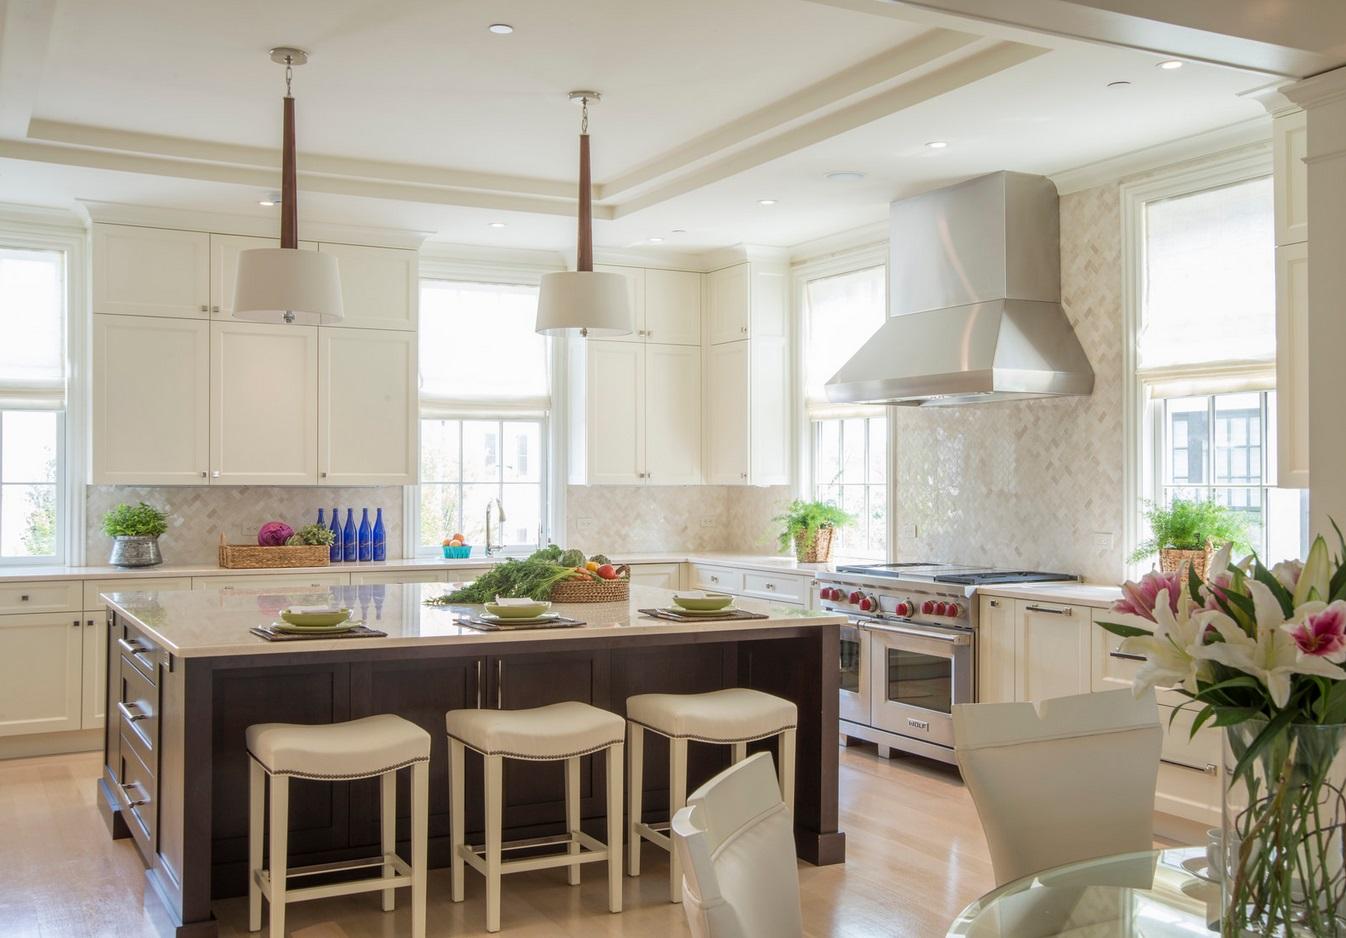 PalindromeDesign_Cityglamour_kitchen1.jpg